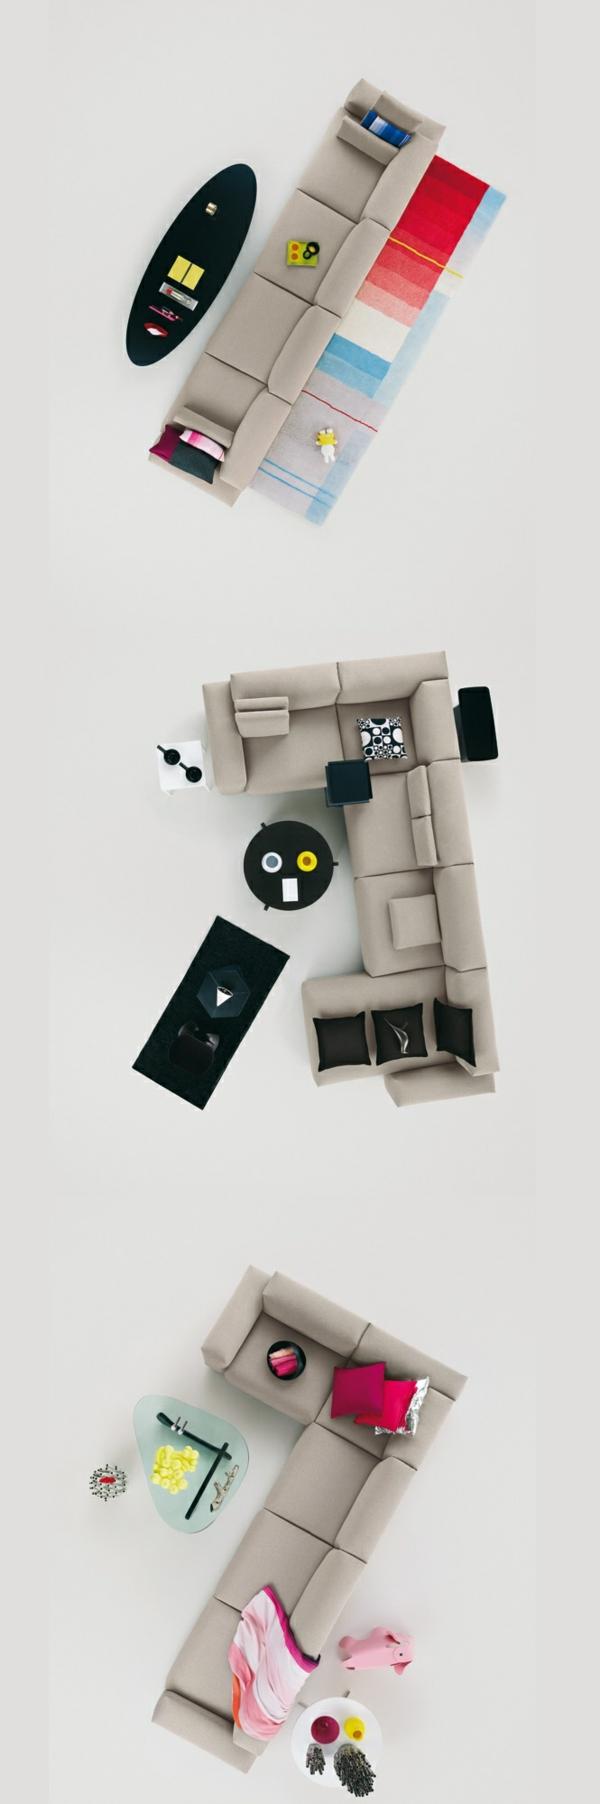 модерни-дивани-интериор-обзавеждане-идеи